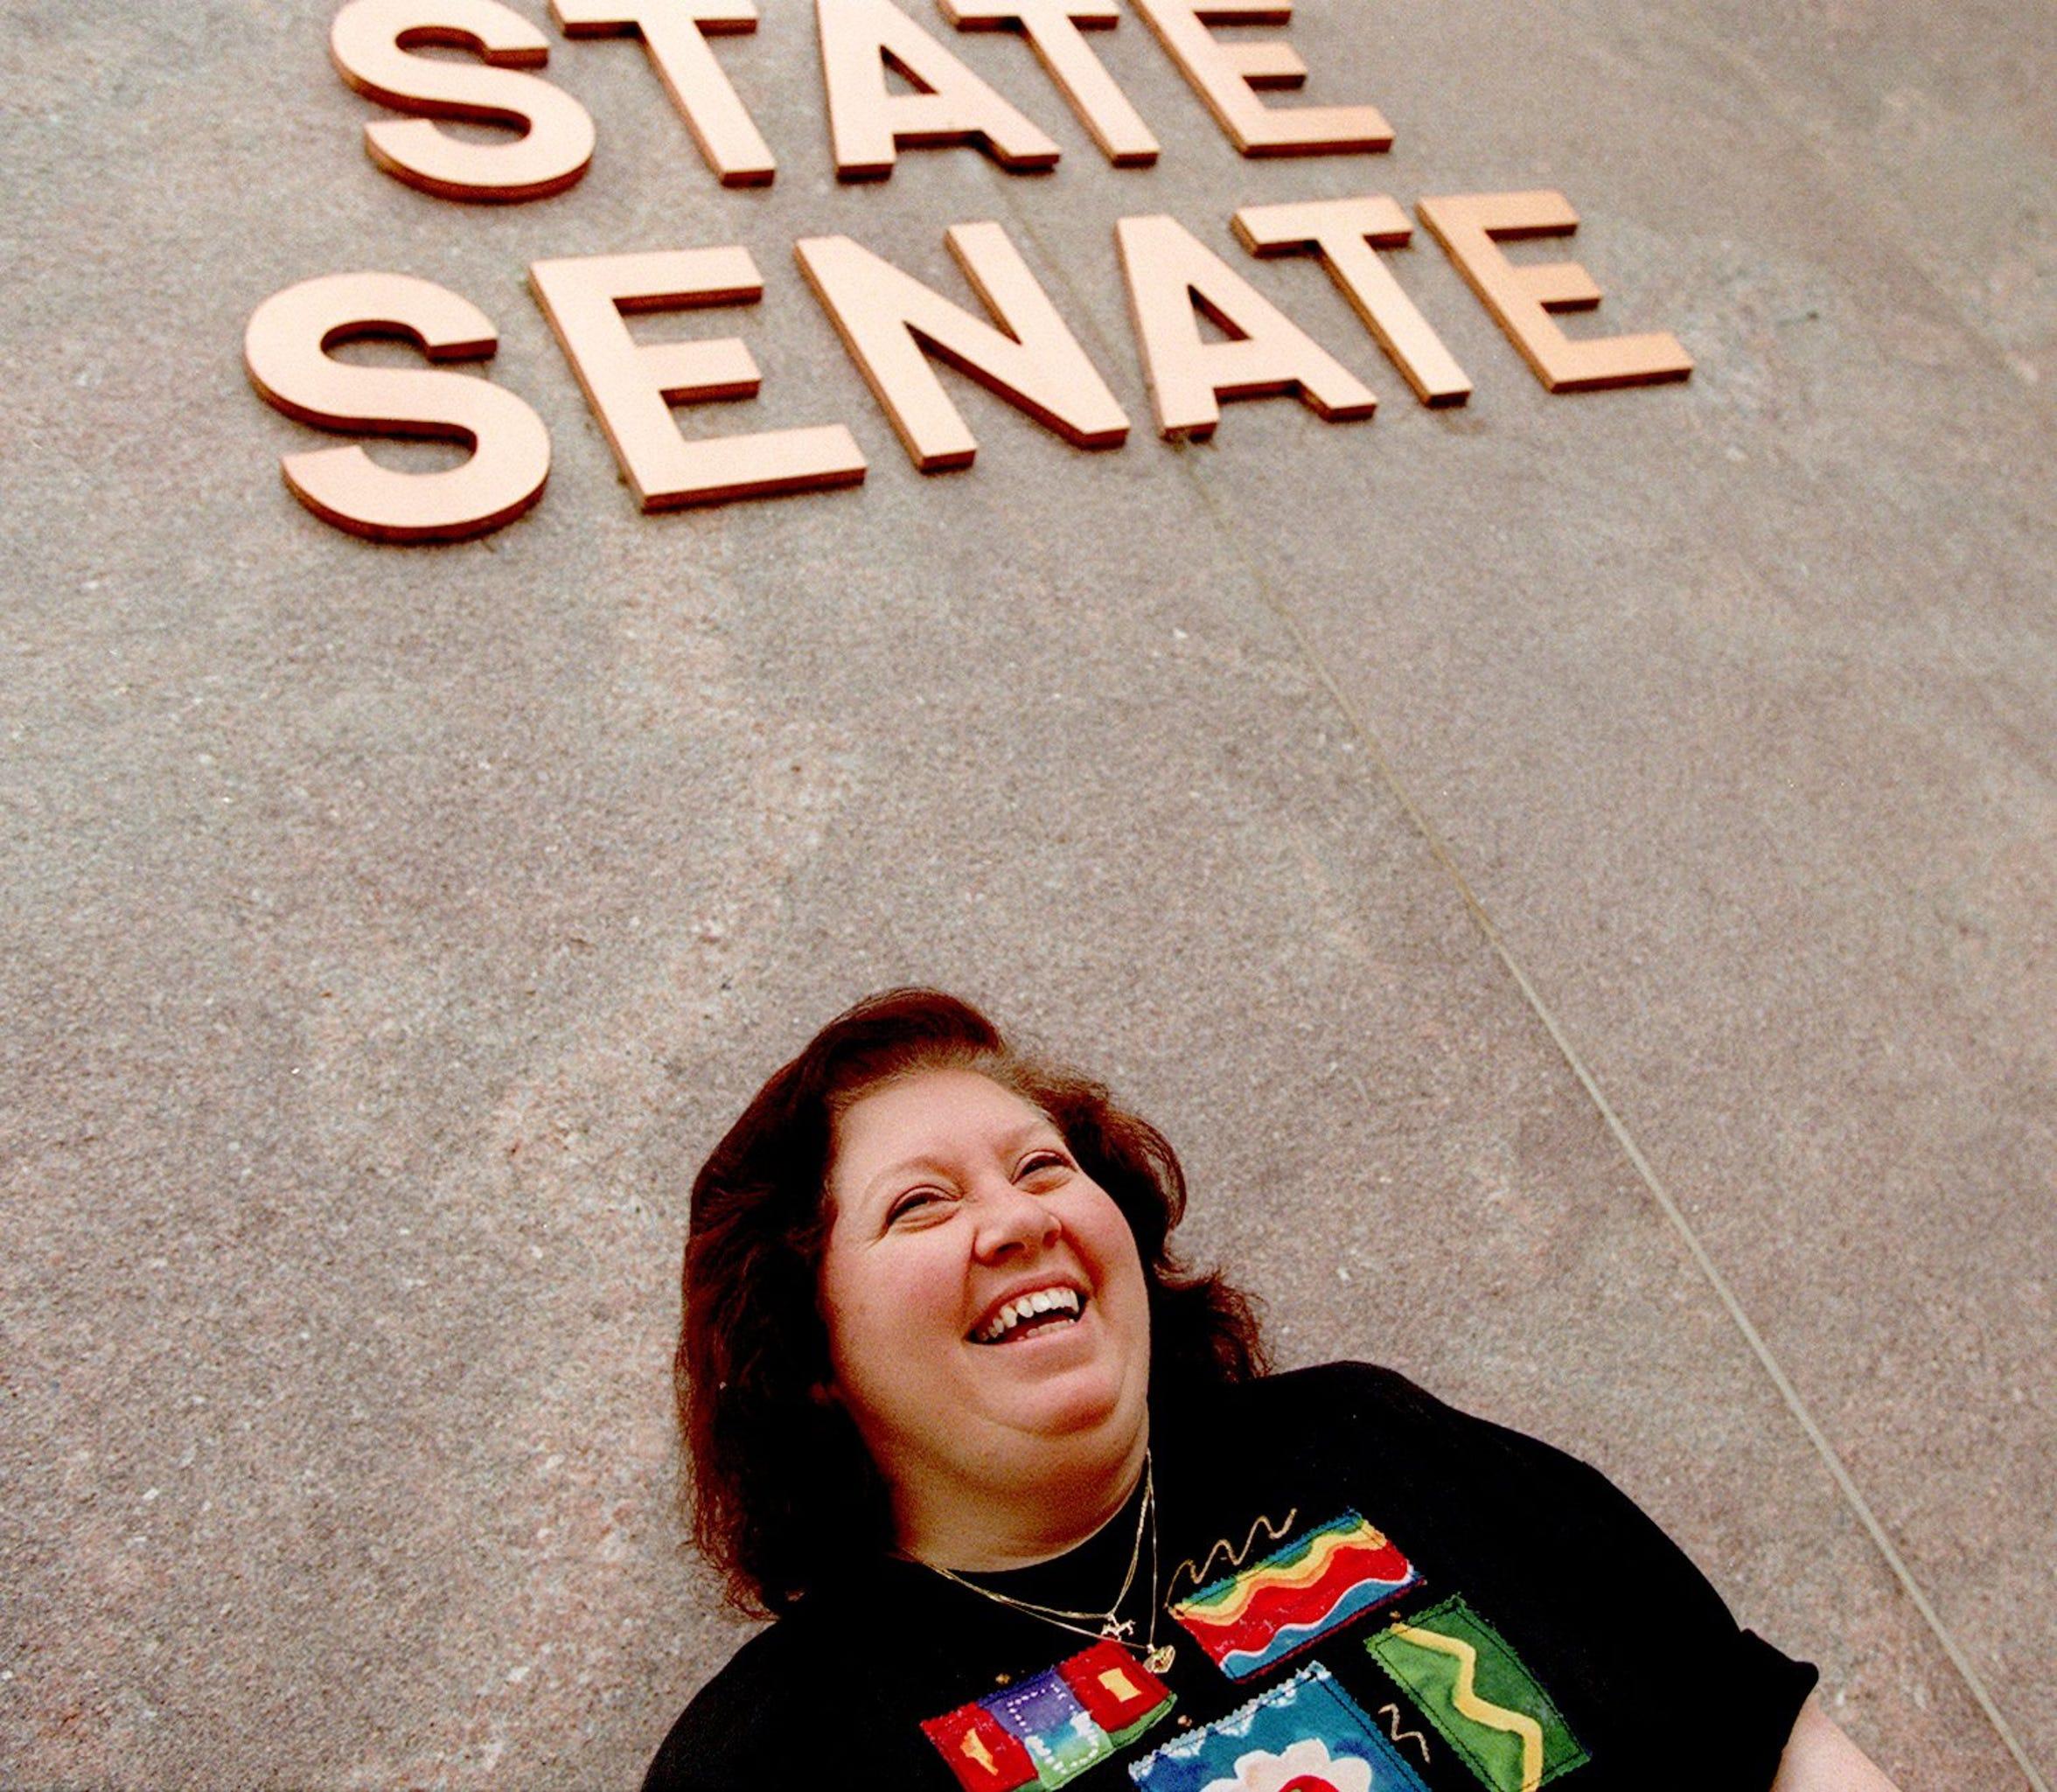 Mary Hartley, former state legislator, pushed for greater regulation of charter schools.